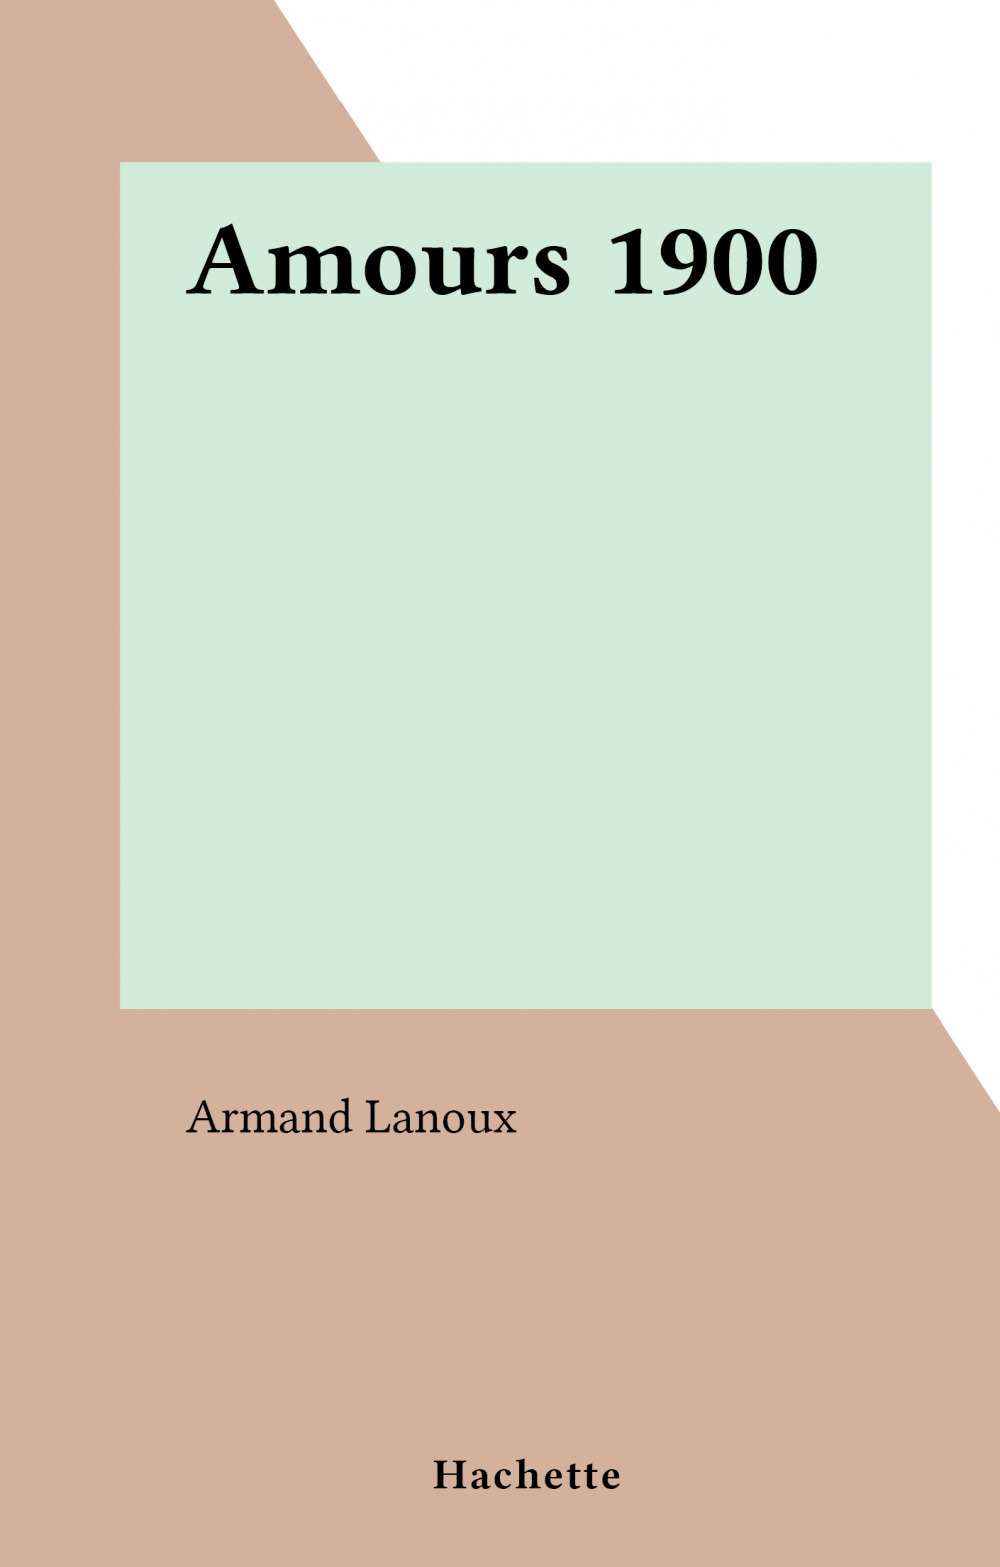 Amours 1900  - Armand Lanoux